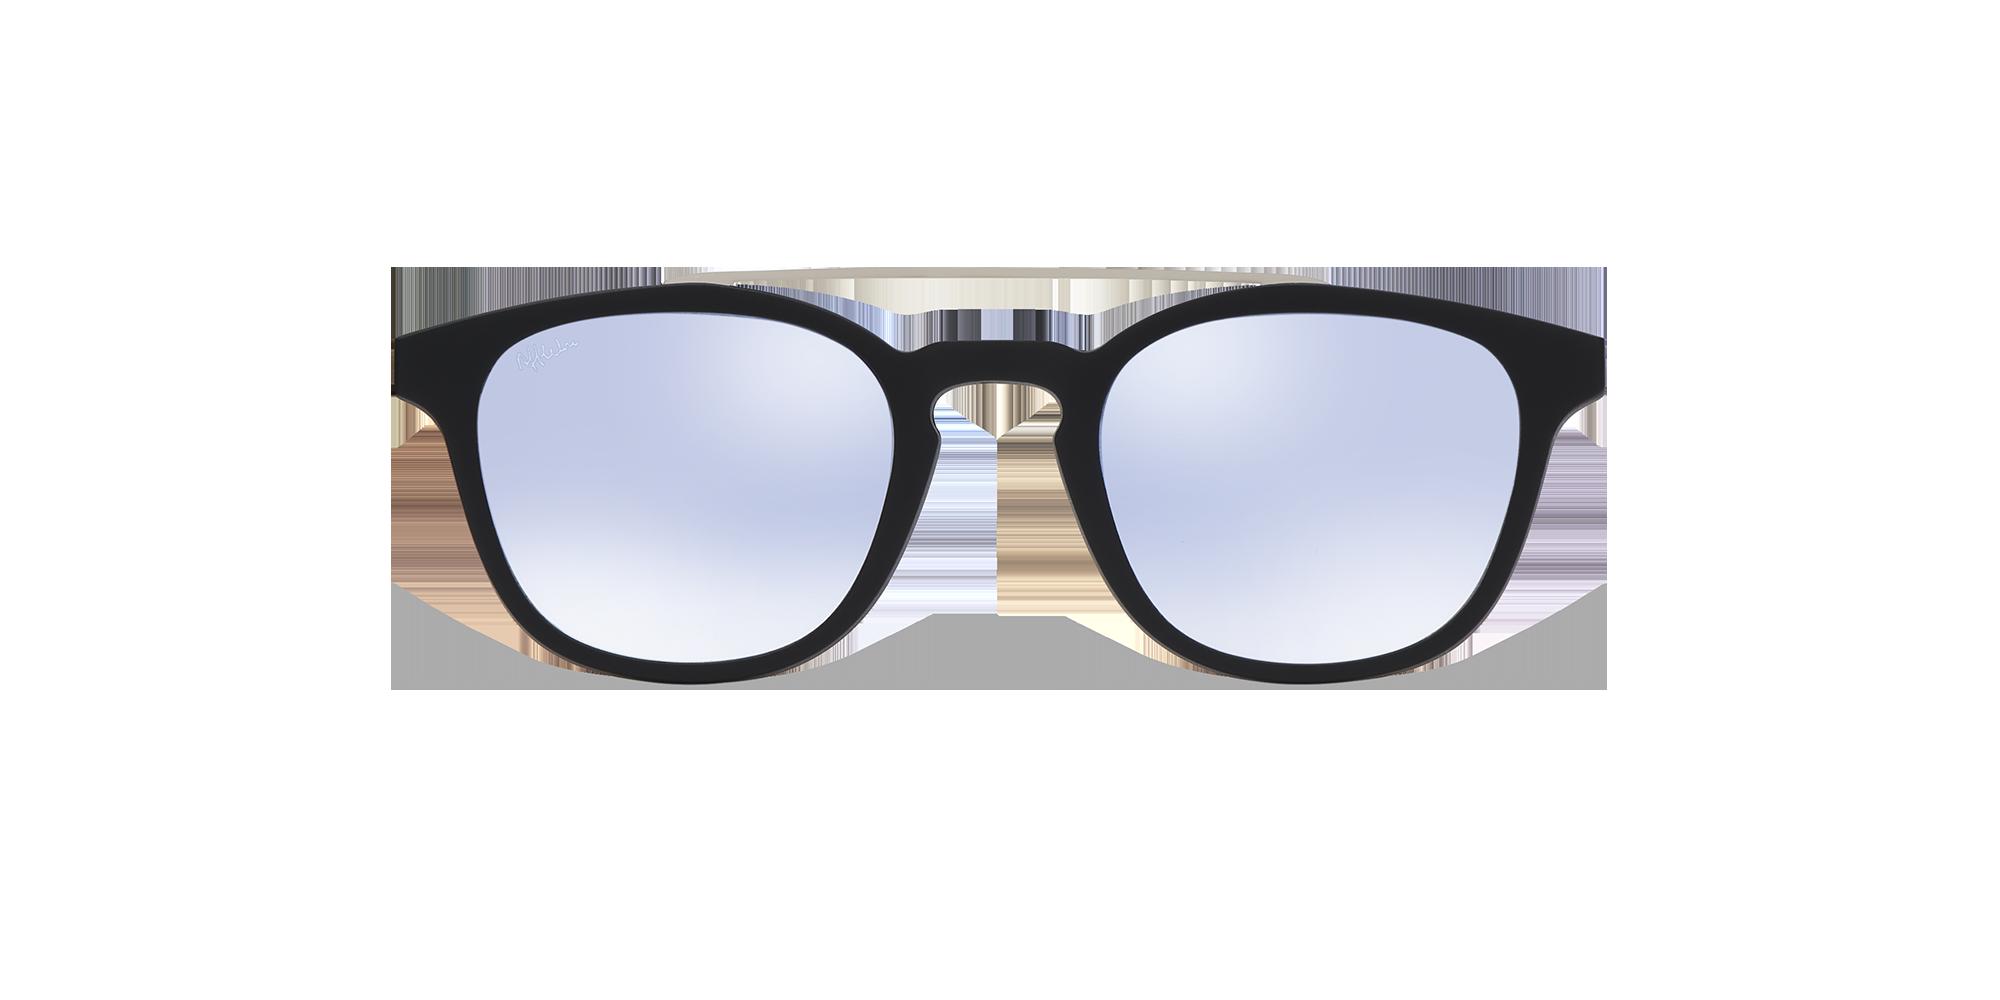 afflelou/france/products/smart_clip/clips_glasses/07630036429327_face.png